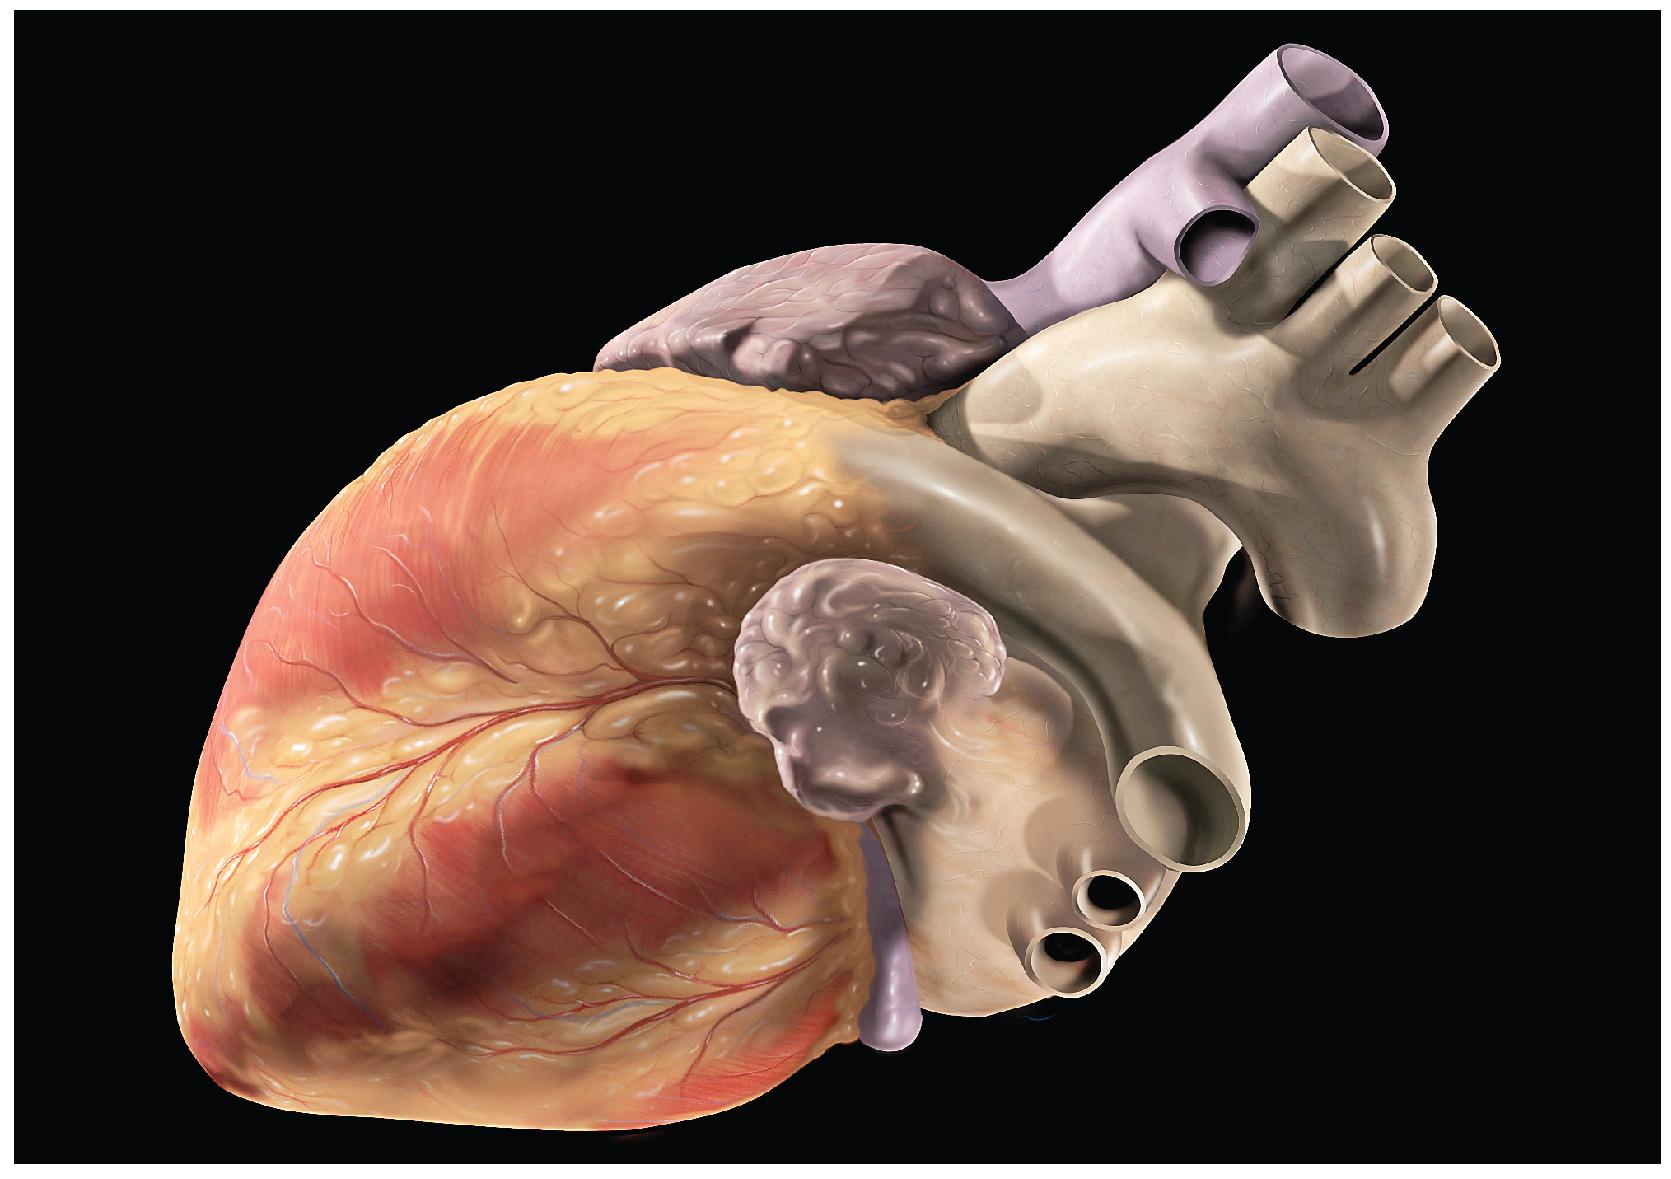 This photo shows a human heart.